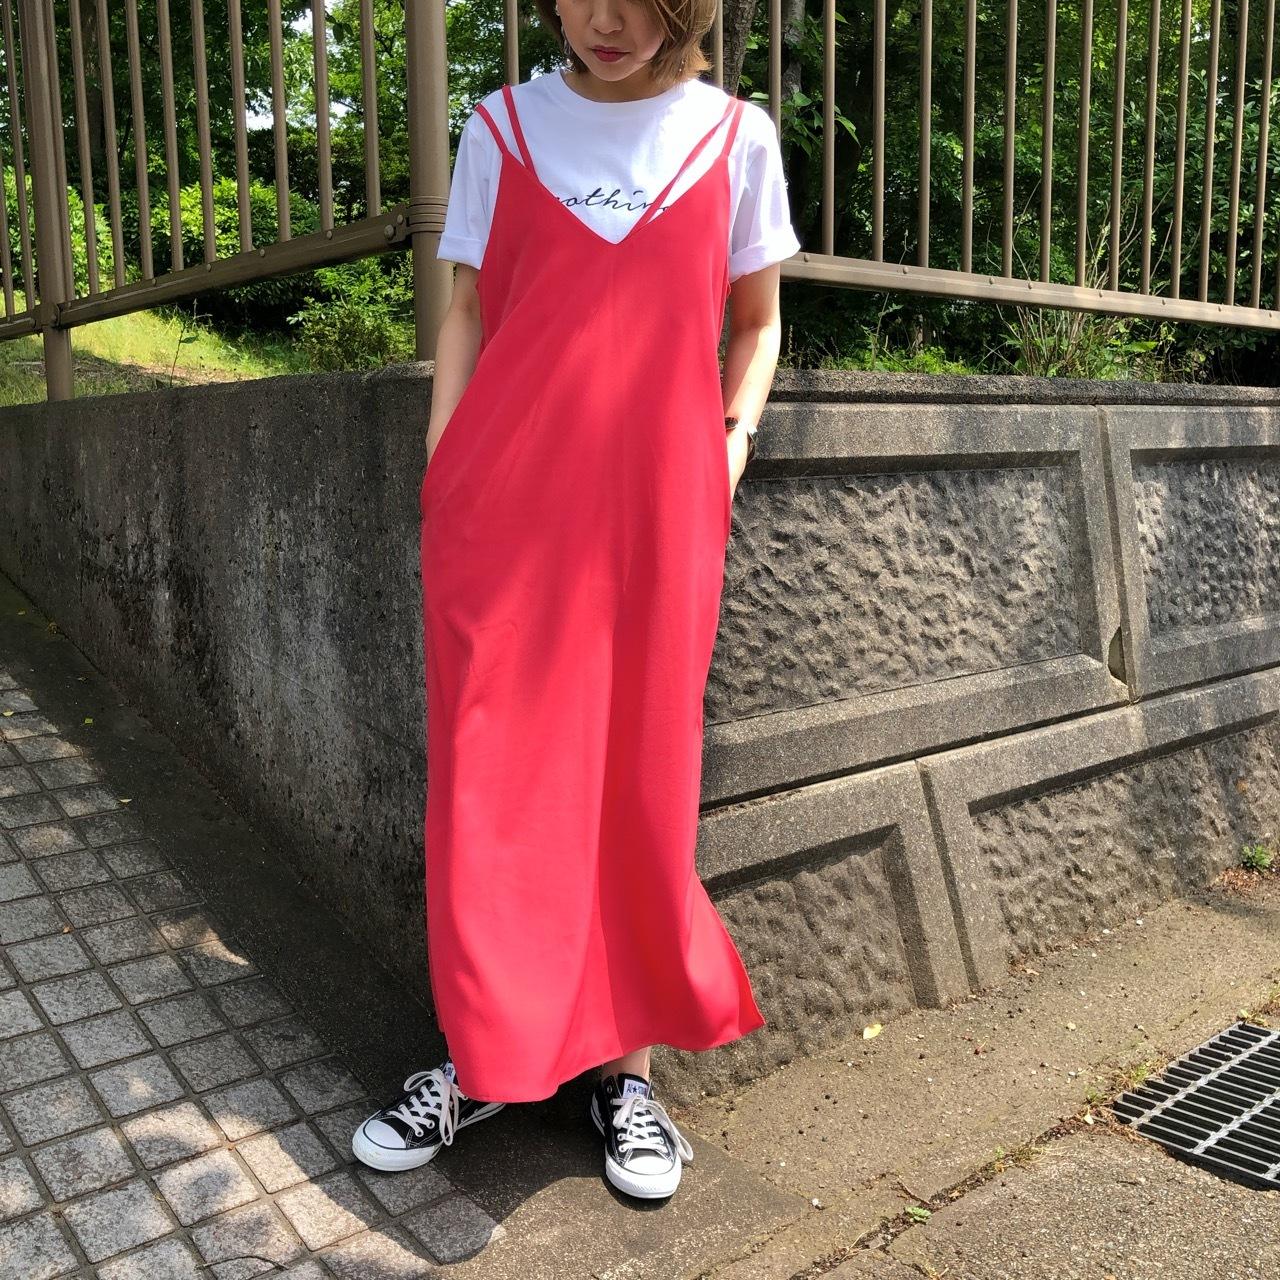 【 CHIGNONSTAR 】- 5201-382 - アシメストラップキャミワンピース